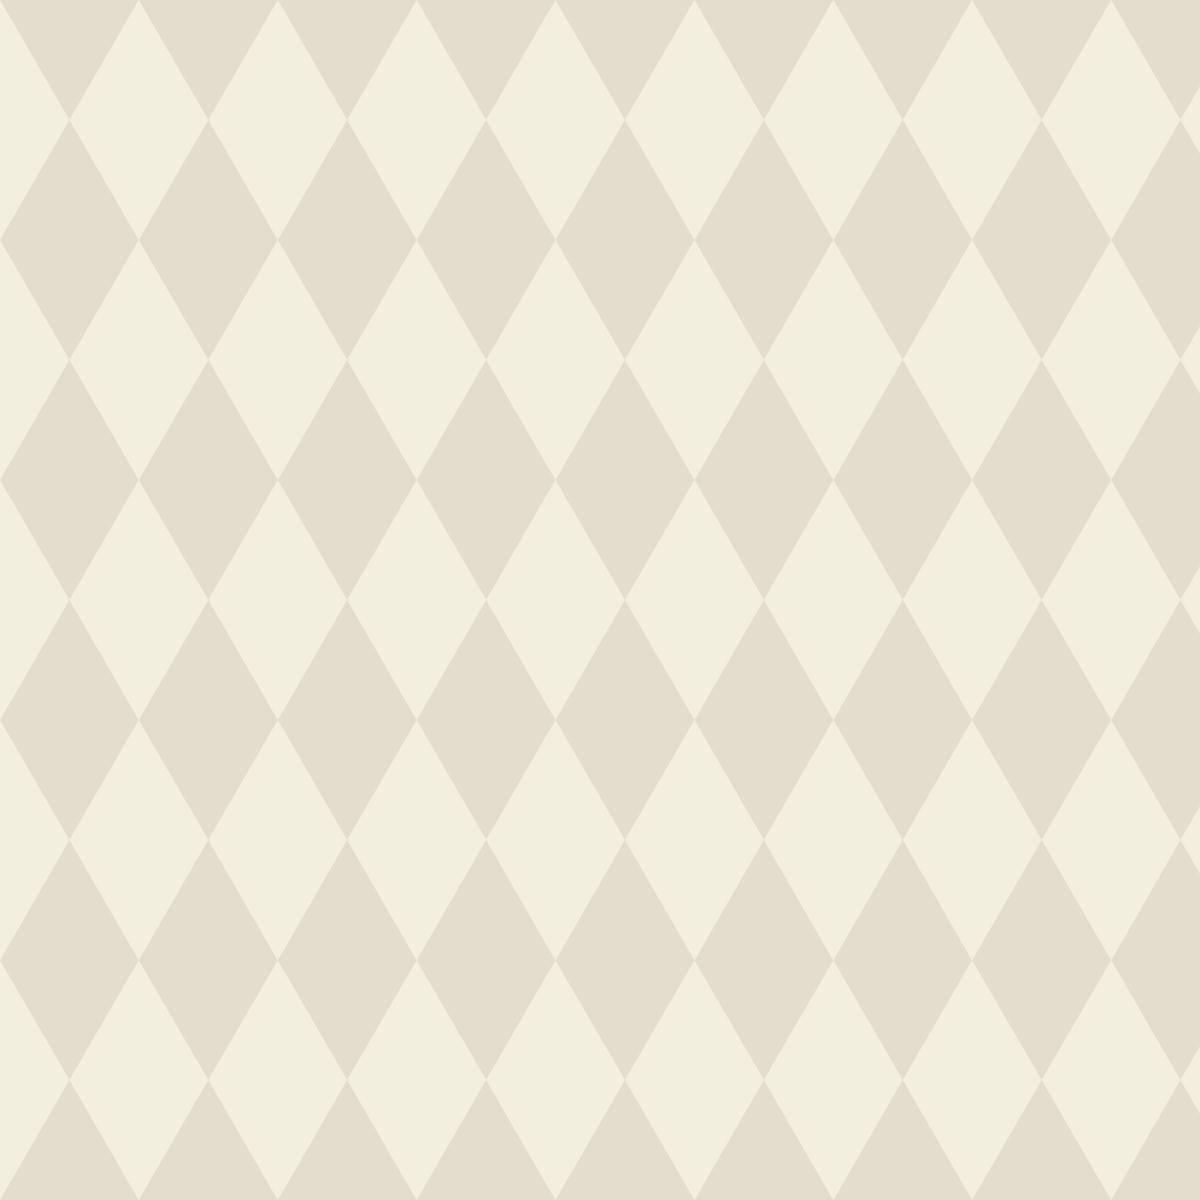 Papel de Parede Losango | Adesivo Vinilico imagem 1